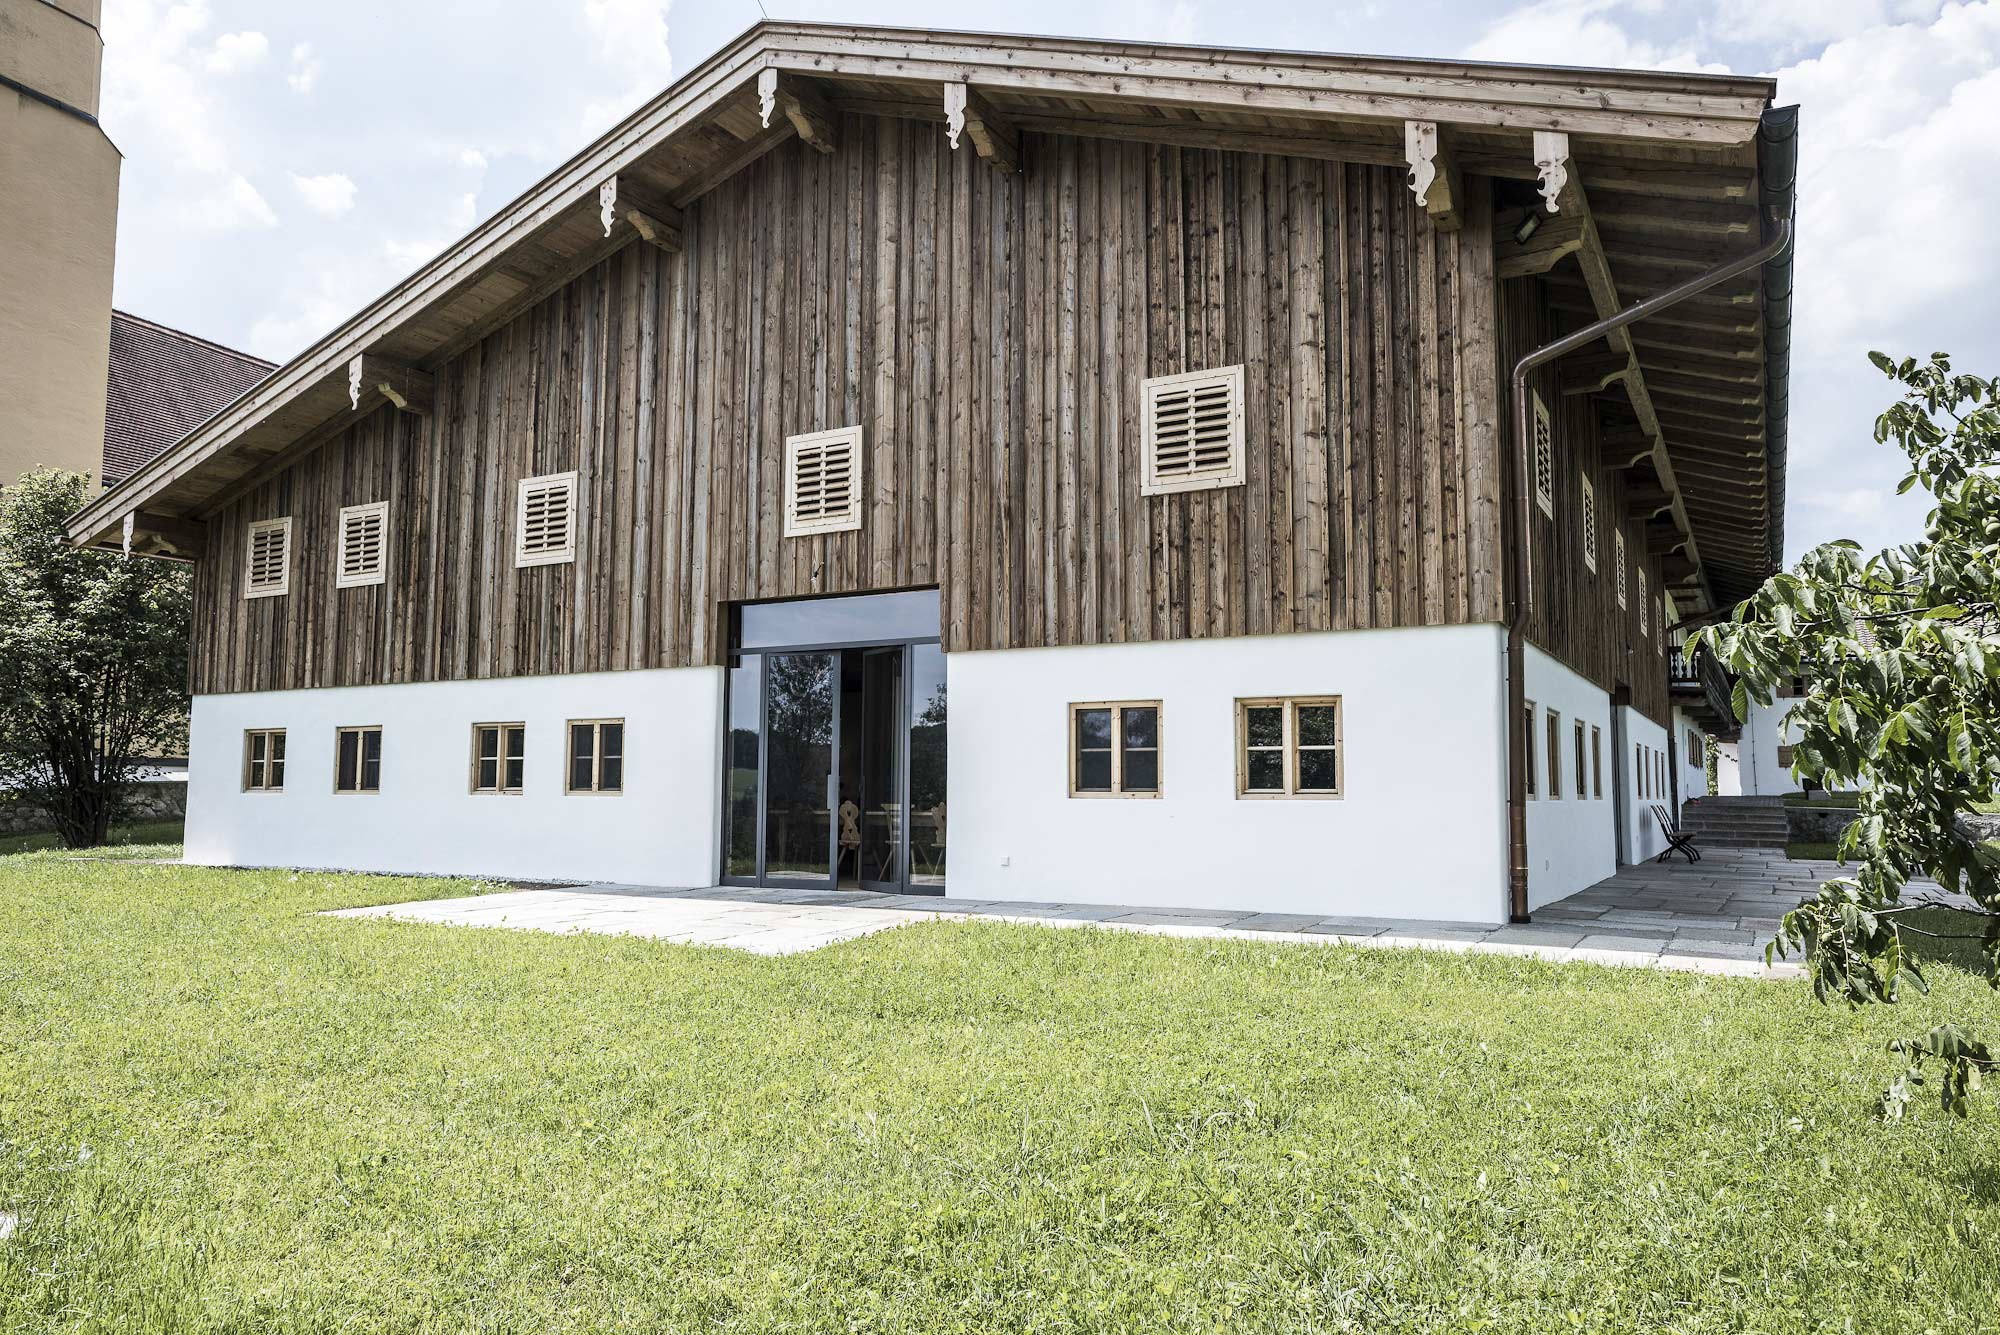 zimmerei-stoib-holzbau-sanierung-hof-umbau-altholz-innenausbau-festsaal-19.jpg